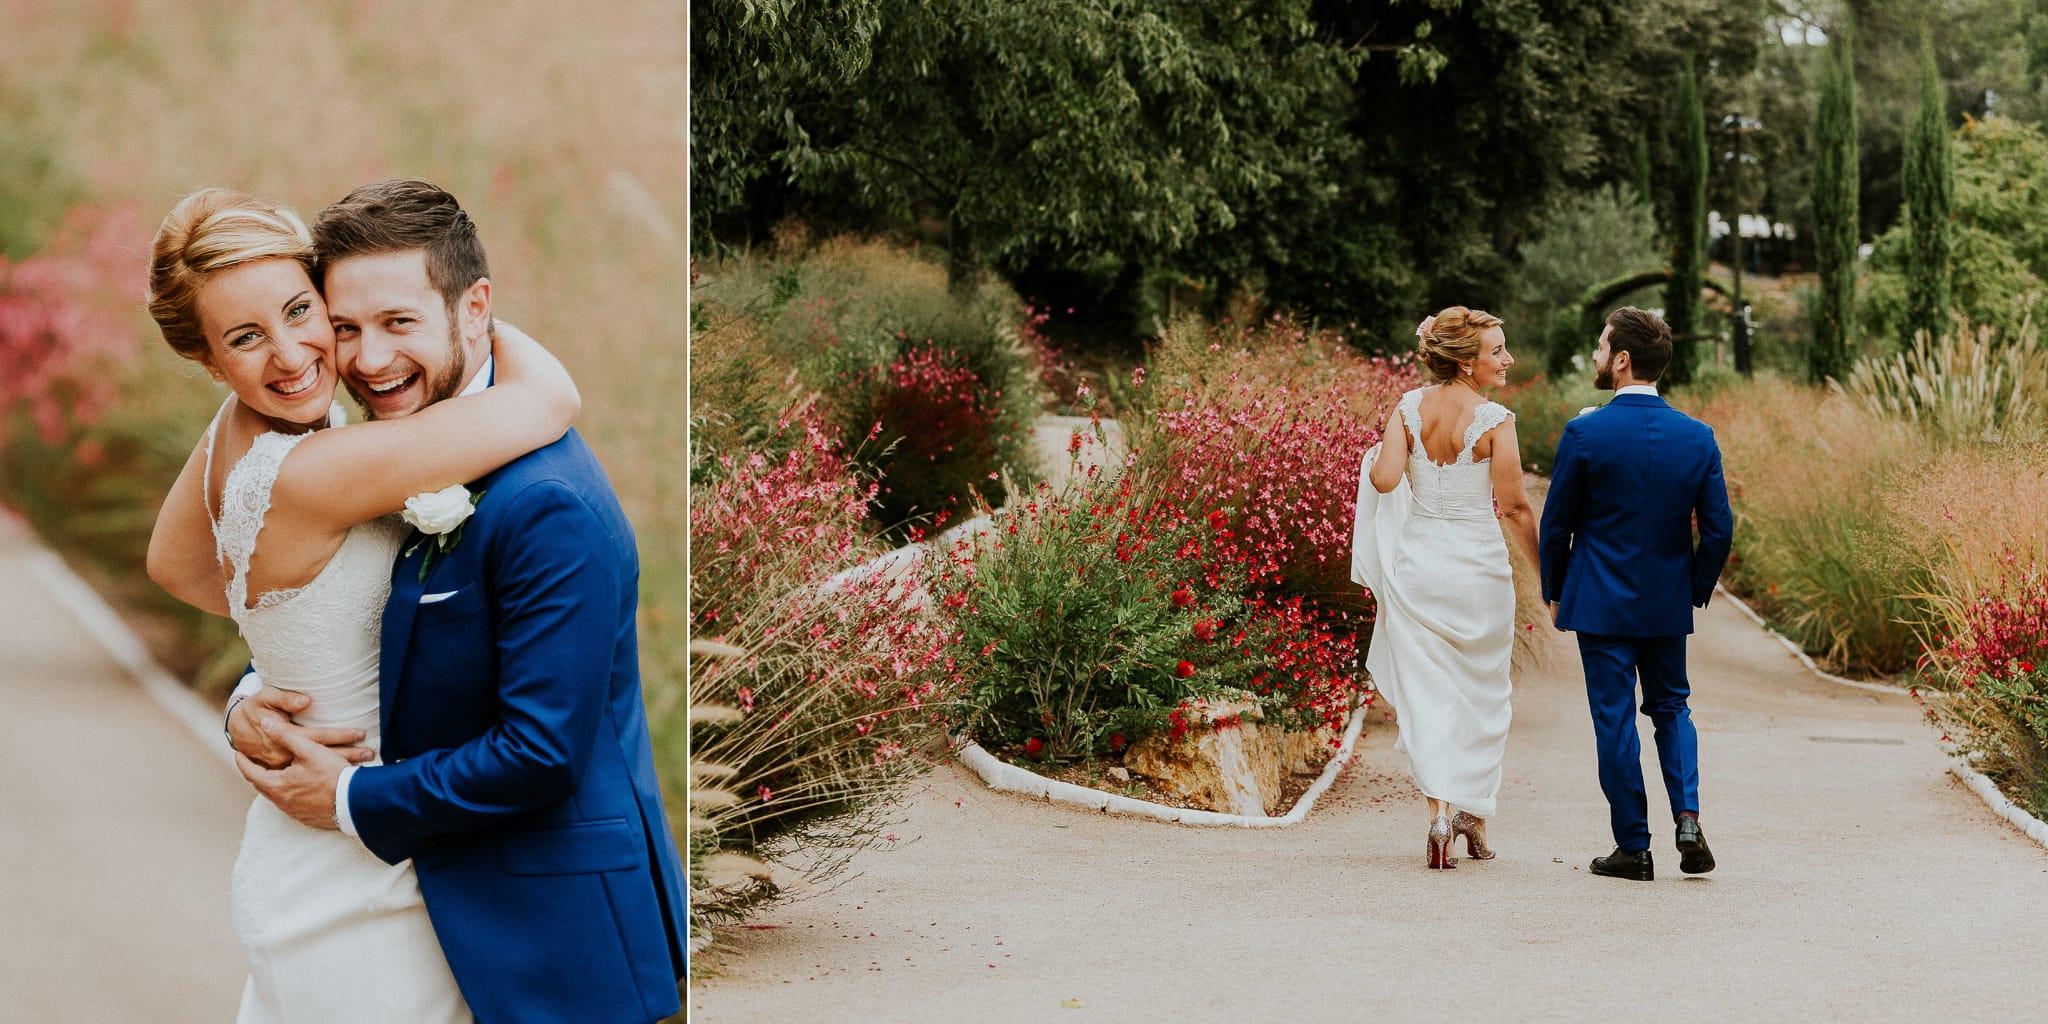 Costi-Moiceanu-Photographer-CM-Photography-Wedding-Mariage-French-Riviera-Cote-D-Azur-Alpes-Maritimes-Weding-Album-Design-17